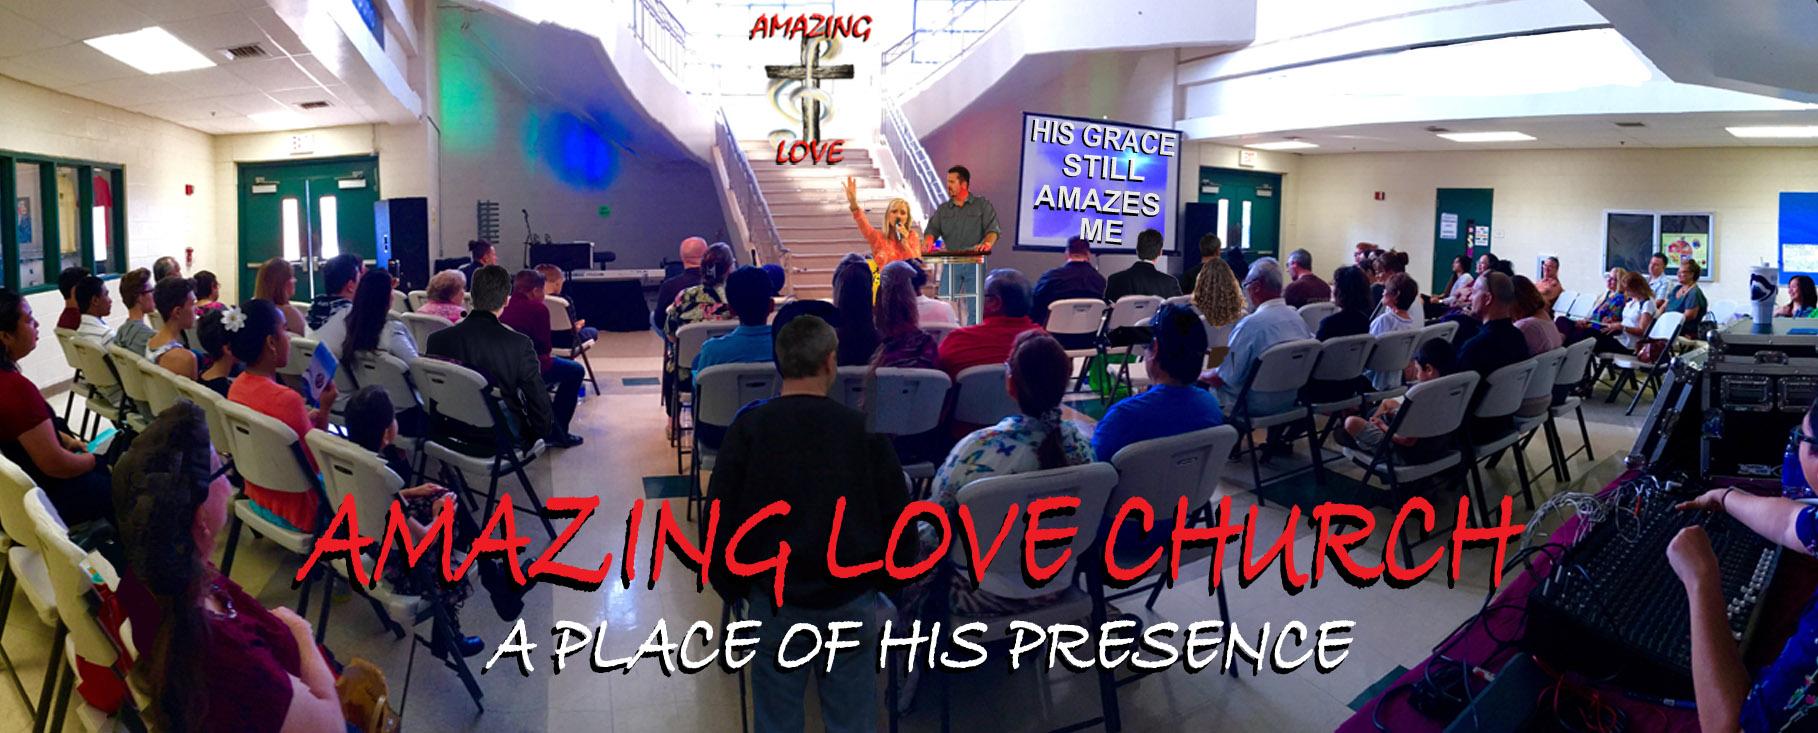 8-19-17 Amazing Love Church - Congregation pic .jpg